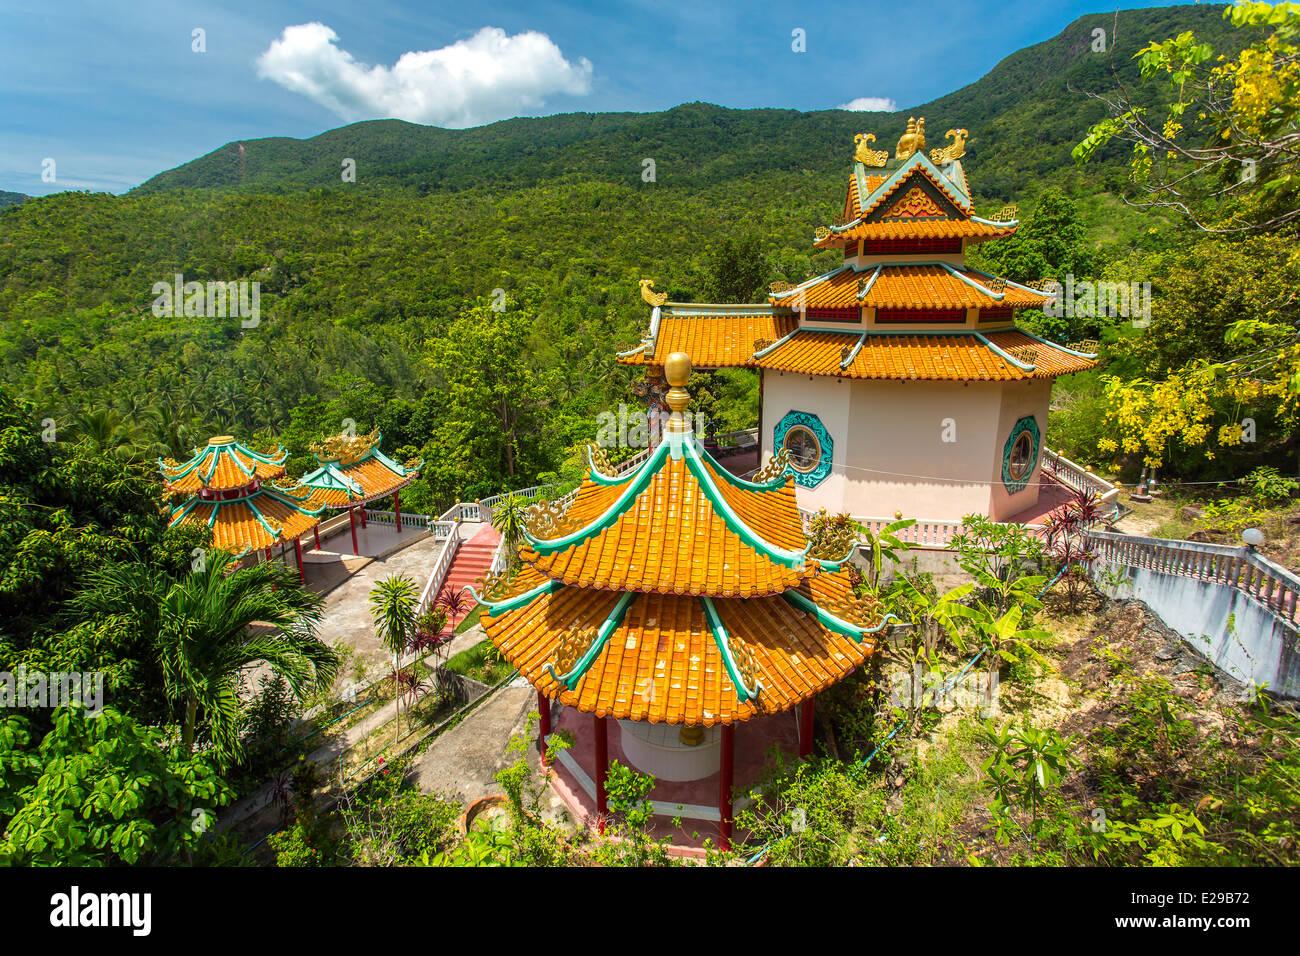 Kuan Yin, chinesische Tempel Chaloklum Bucht auf Koh Phangan, Thailand Stockbild